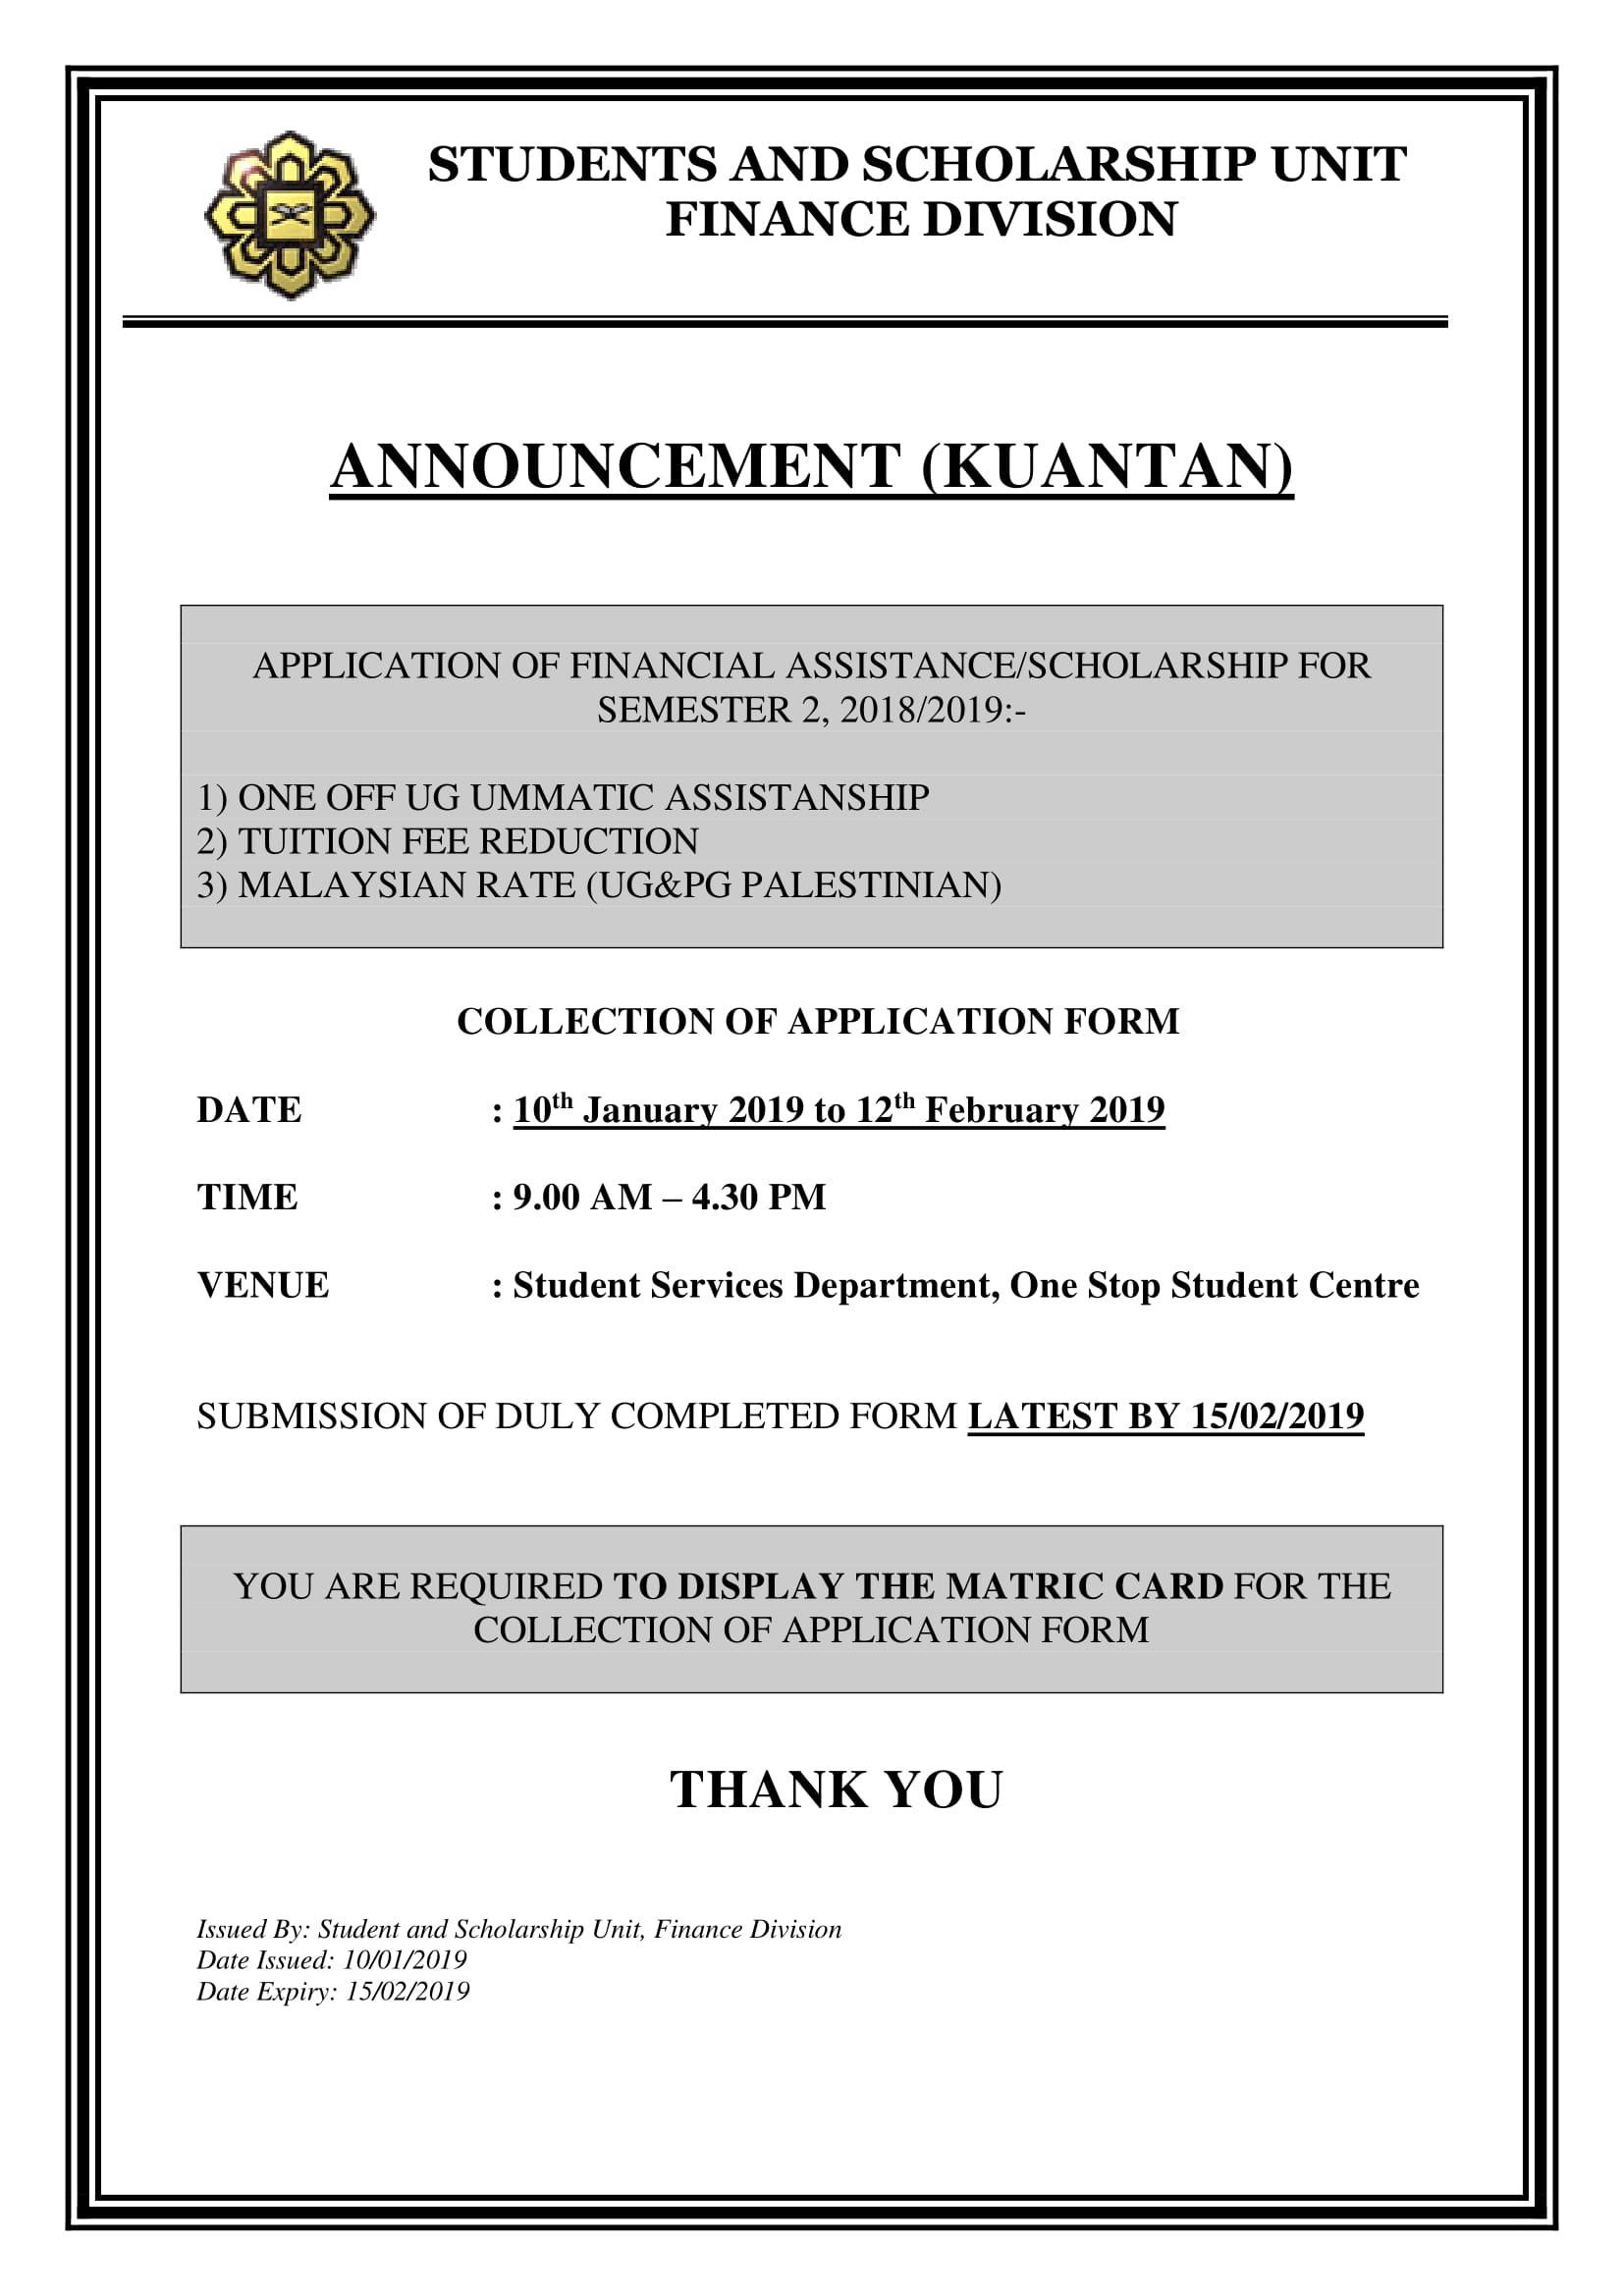 IFAC ANNOUNCEMENT GOMBAK PDF-1